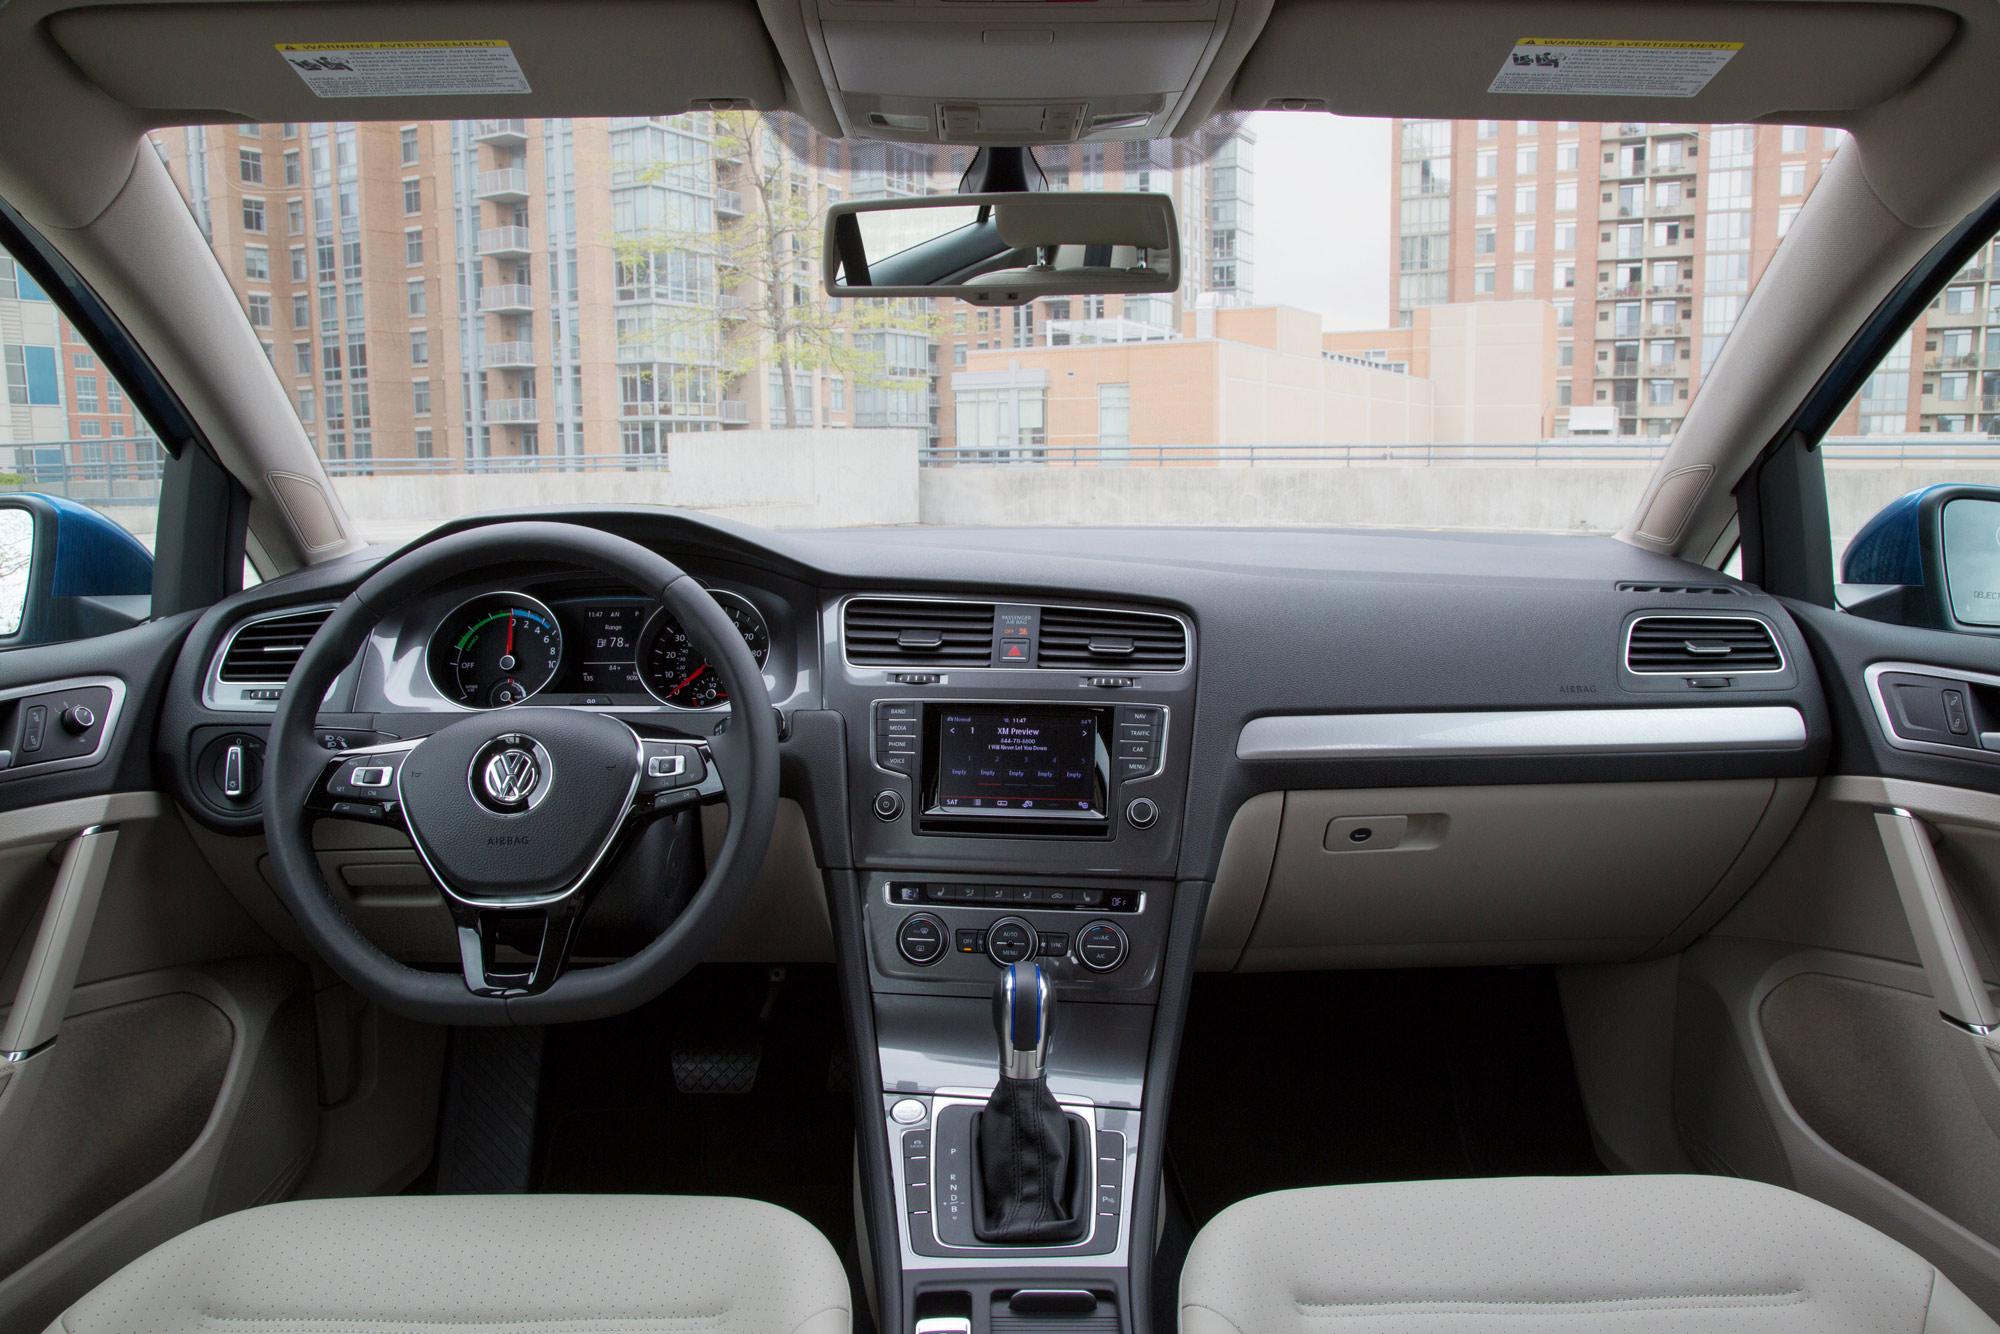 2015-e-Golf-Interior-2